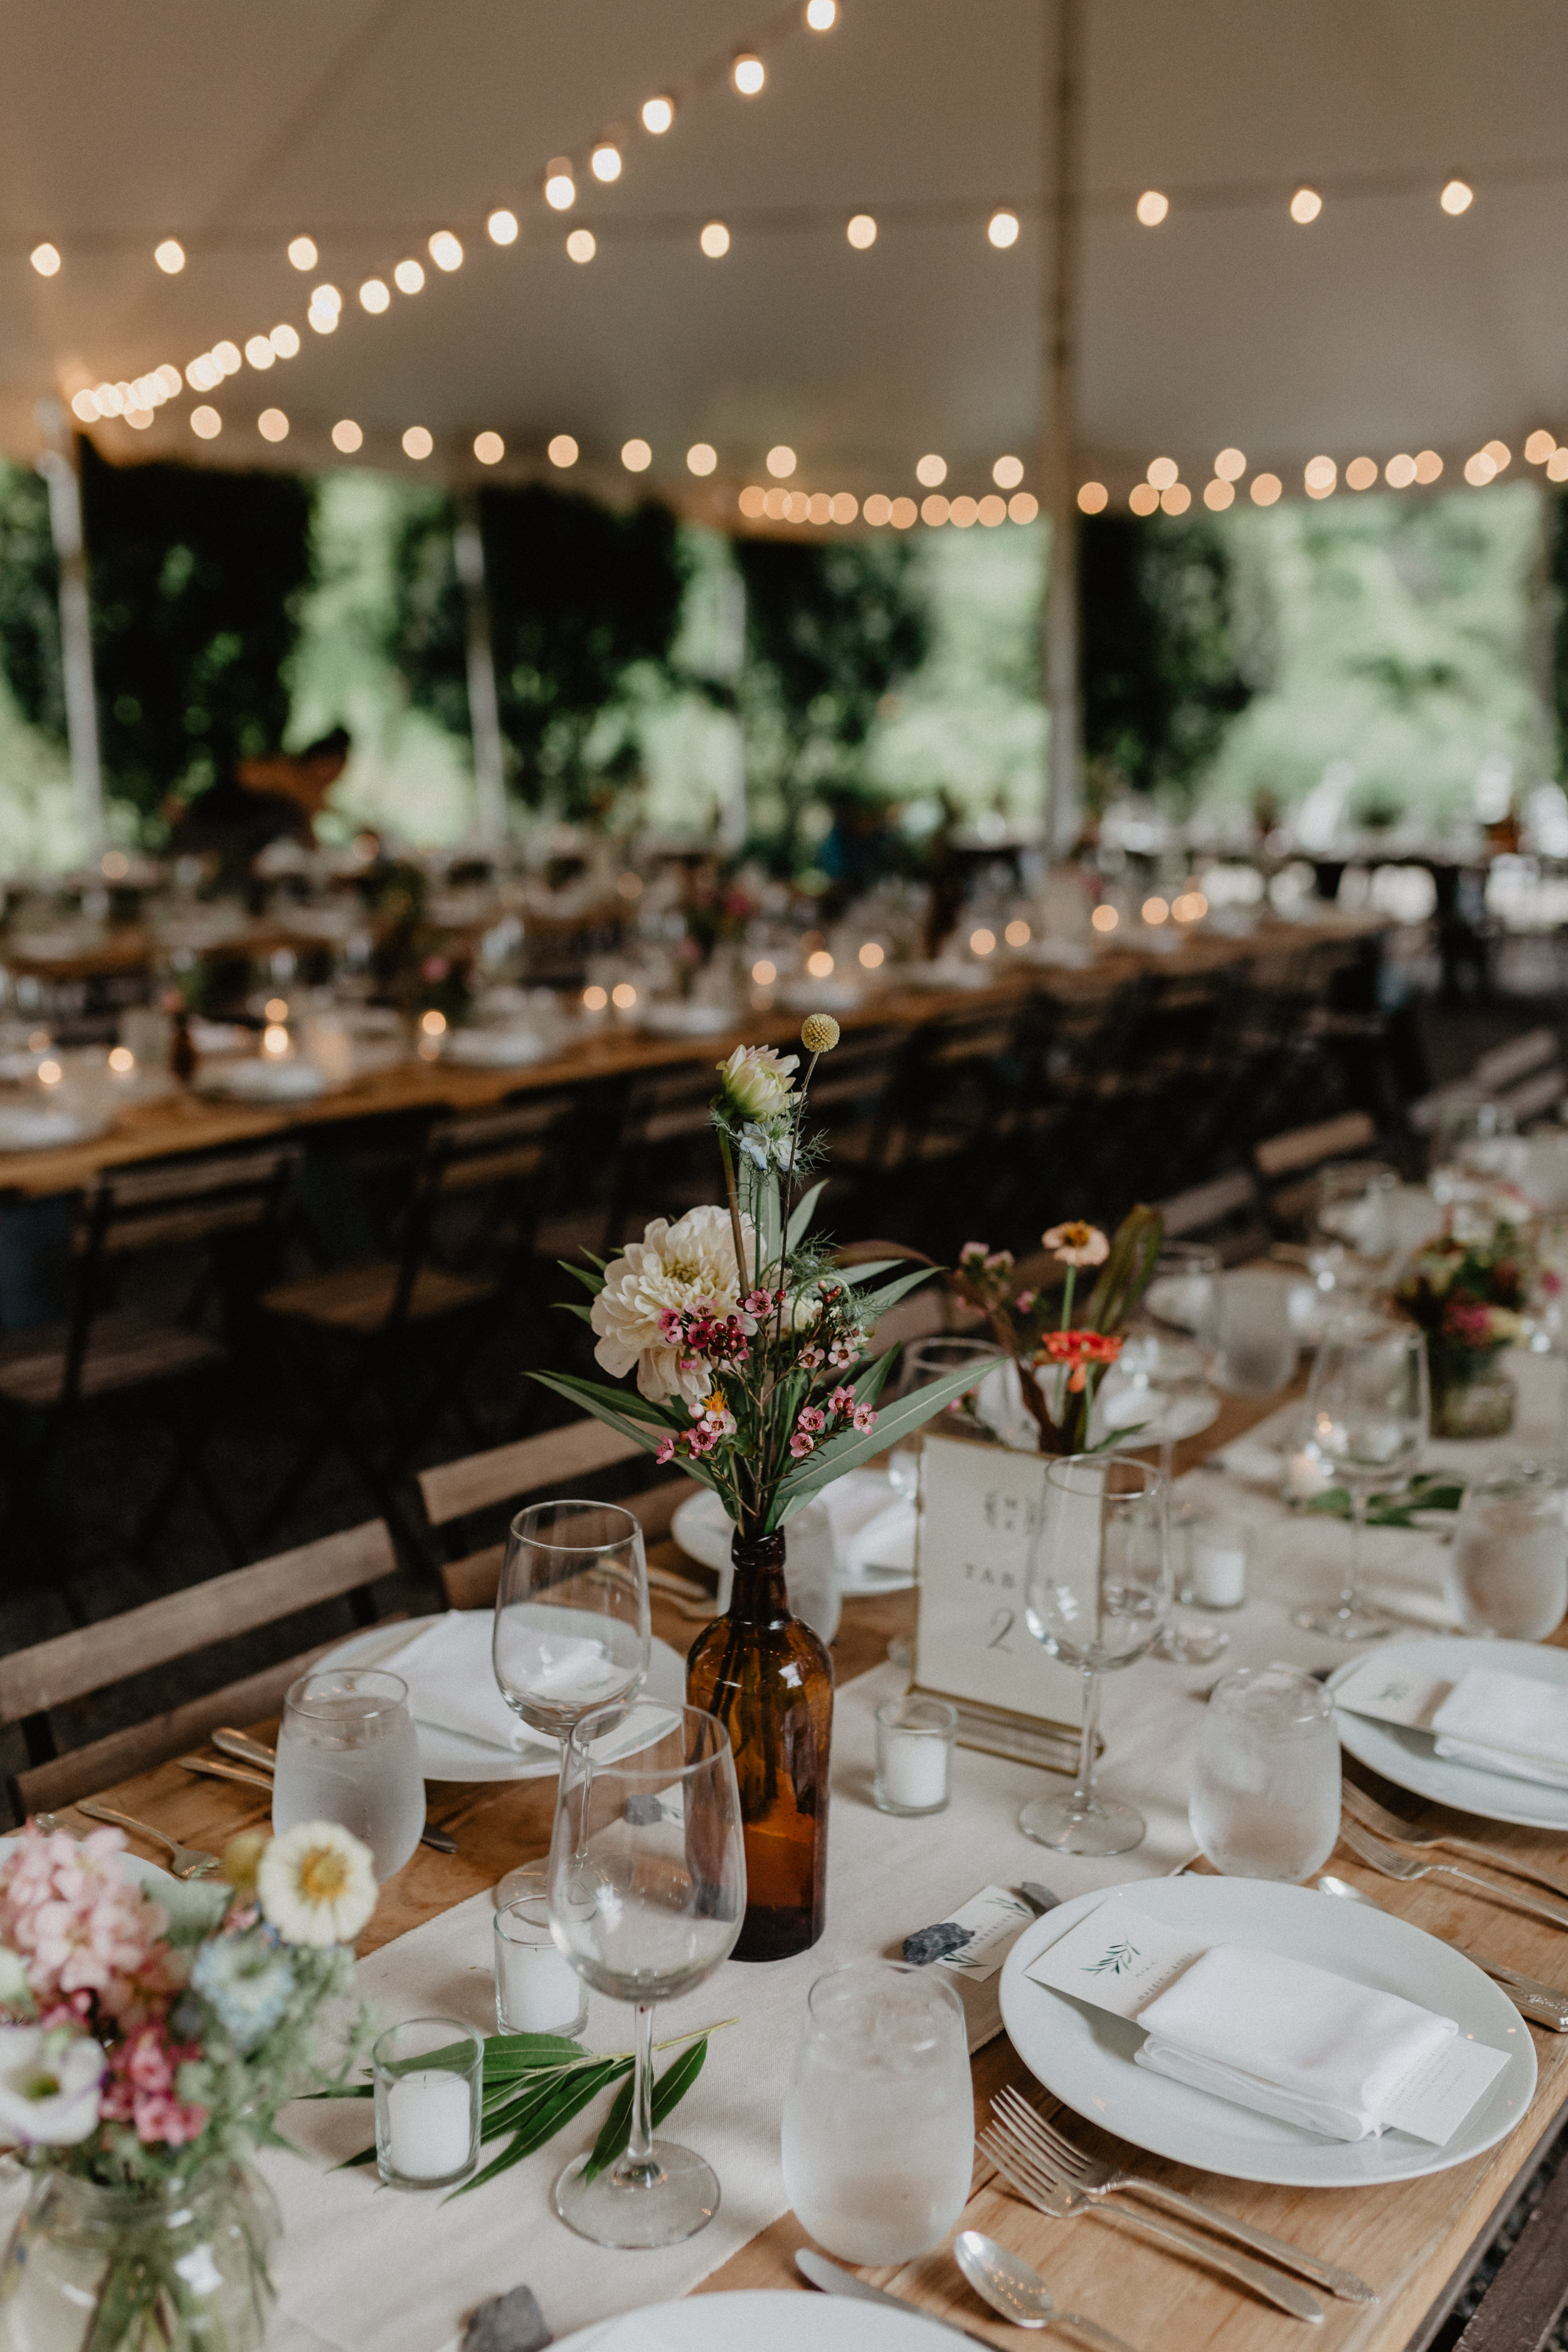 m-and-d-farm-wedding-87.jpg